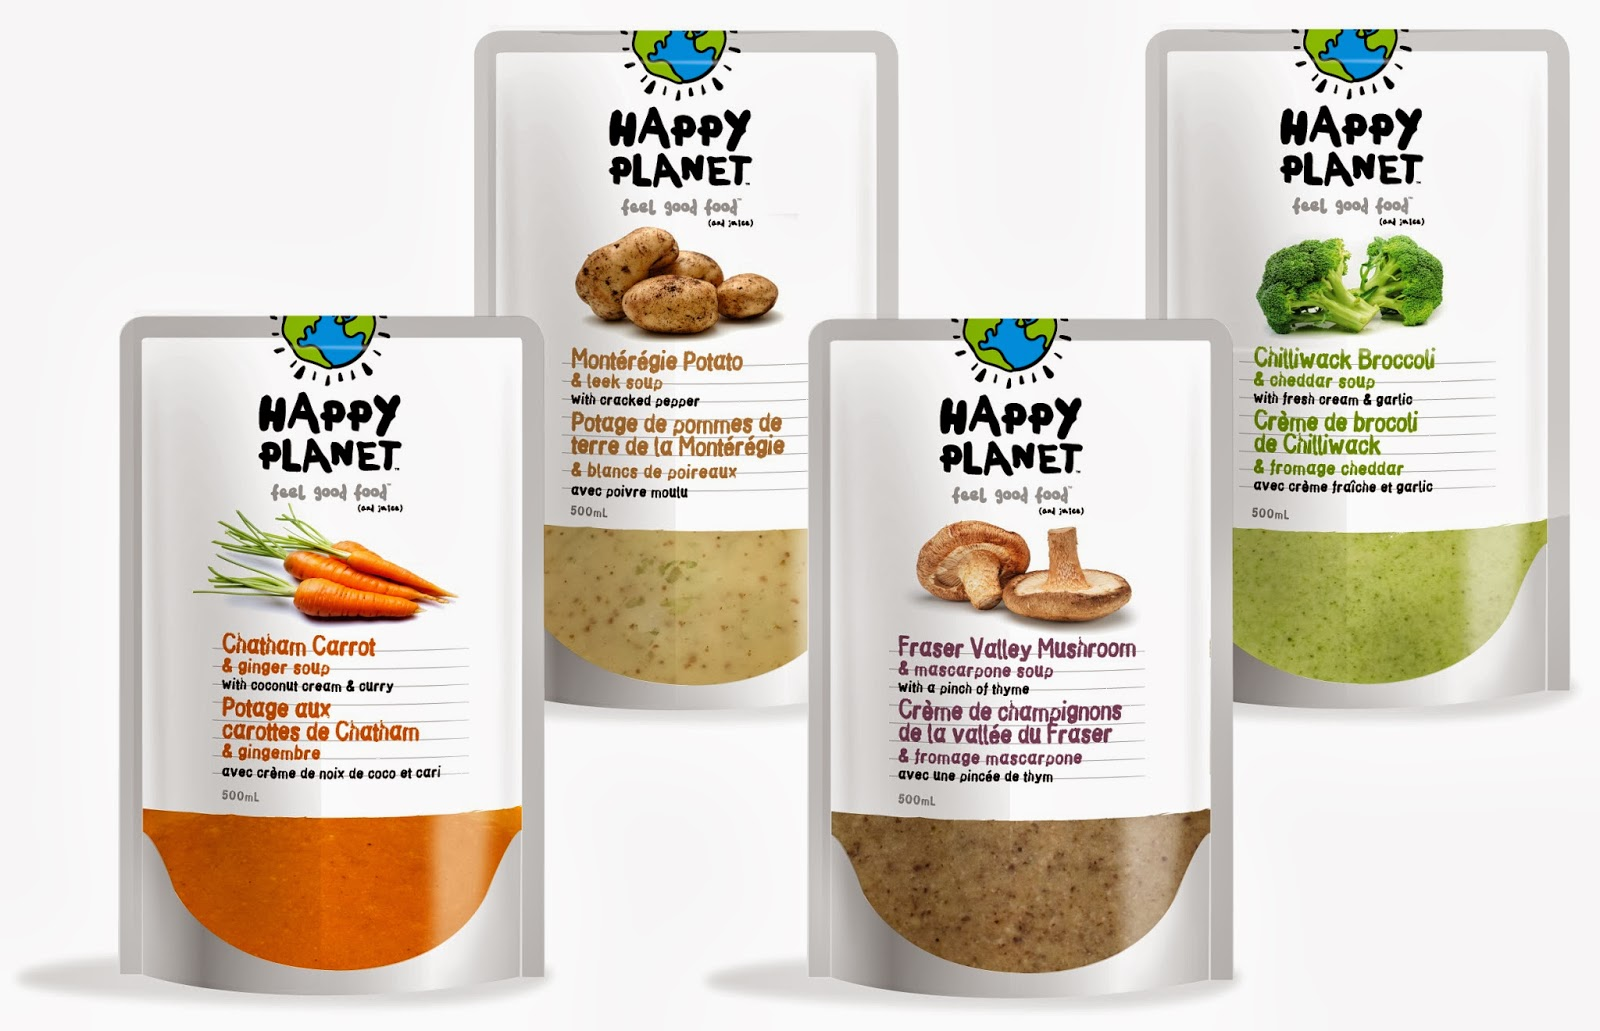 www.happyplanet.com